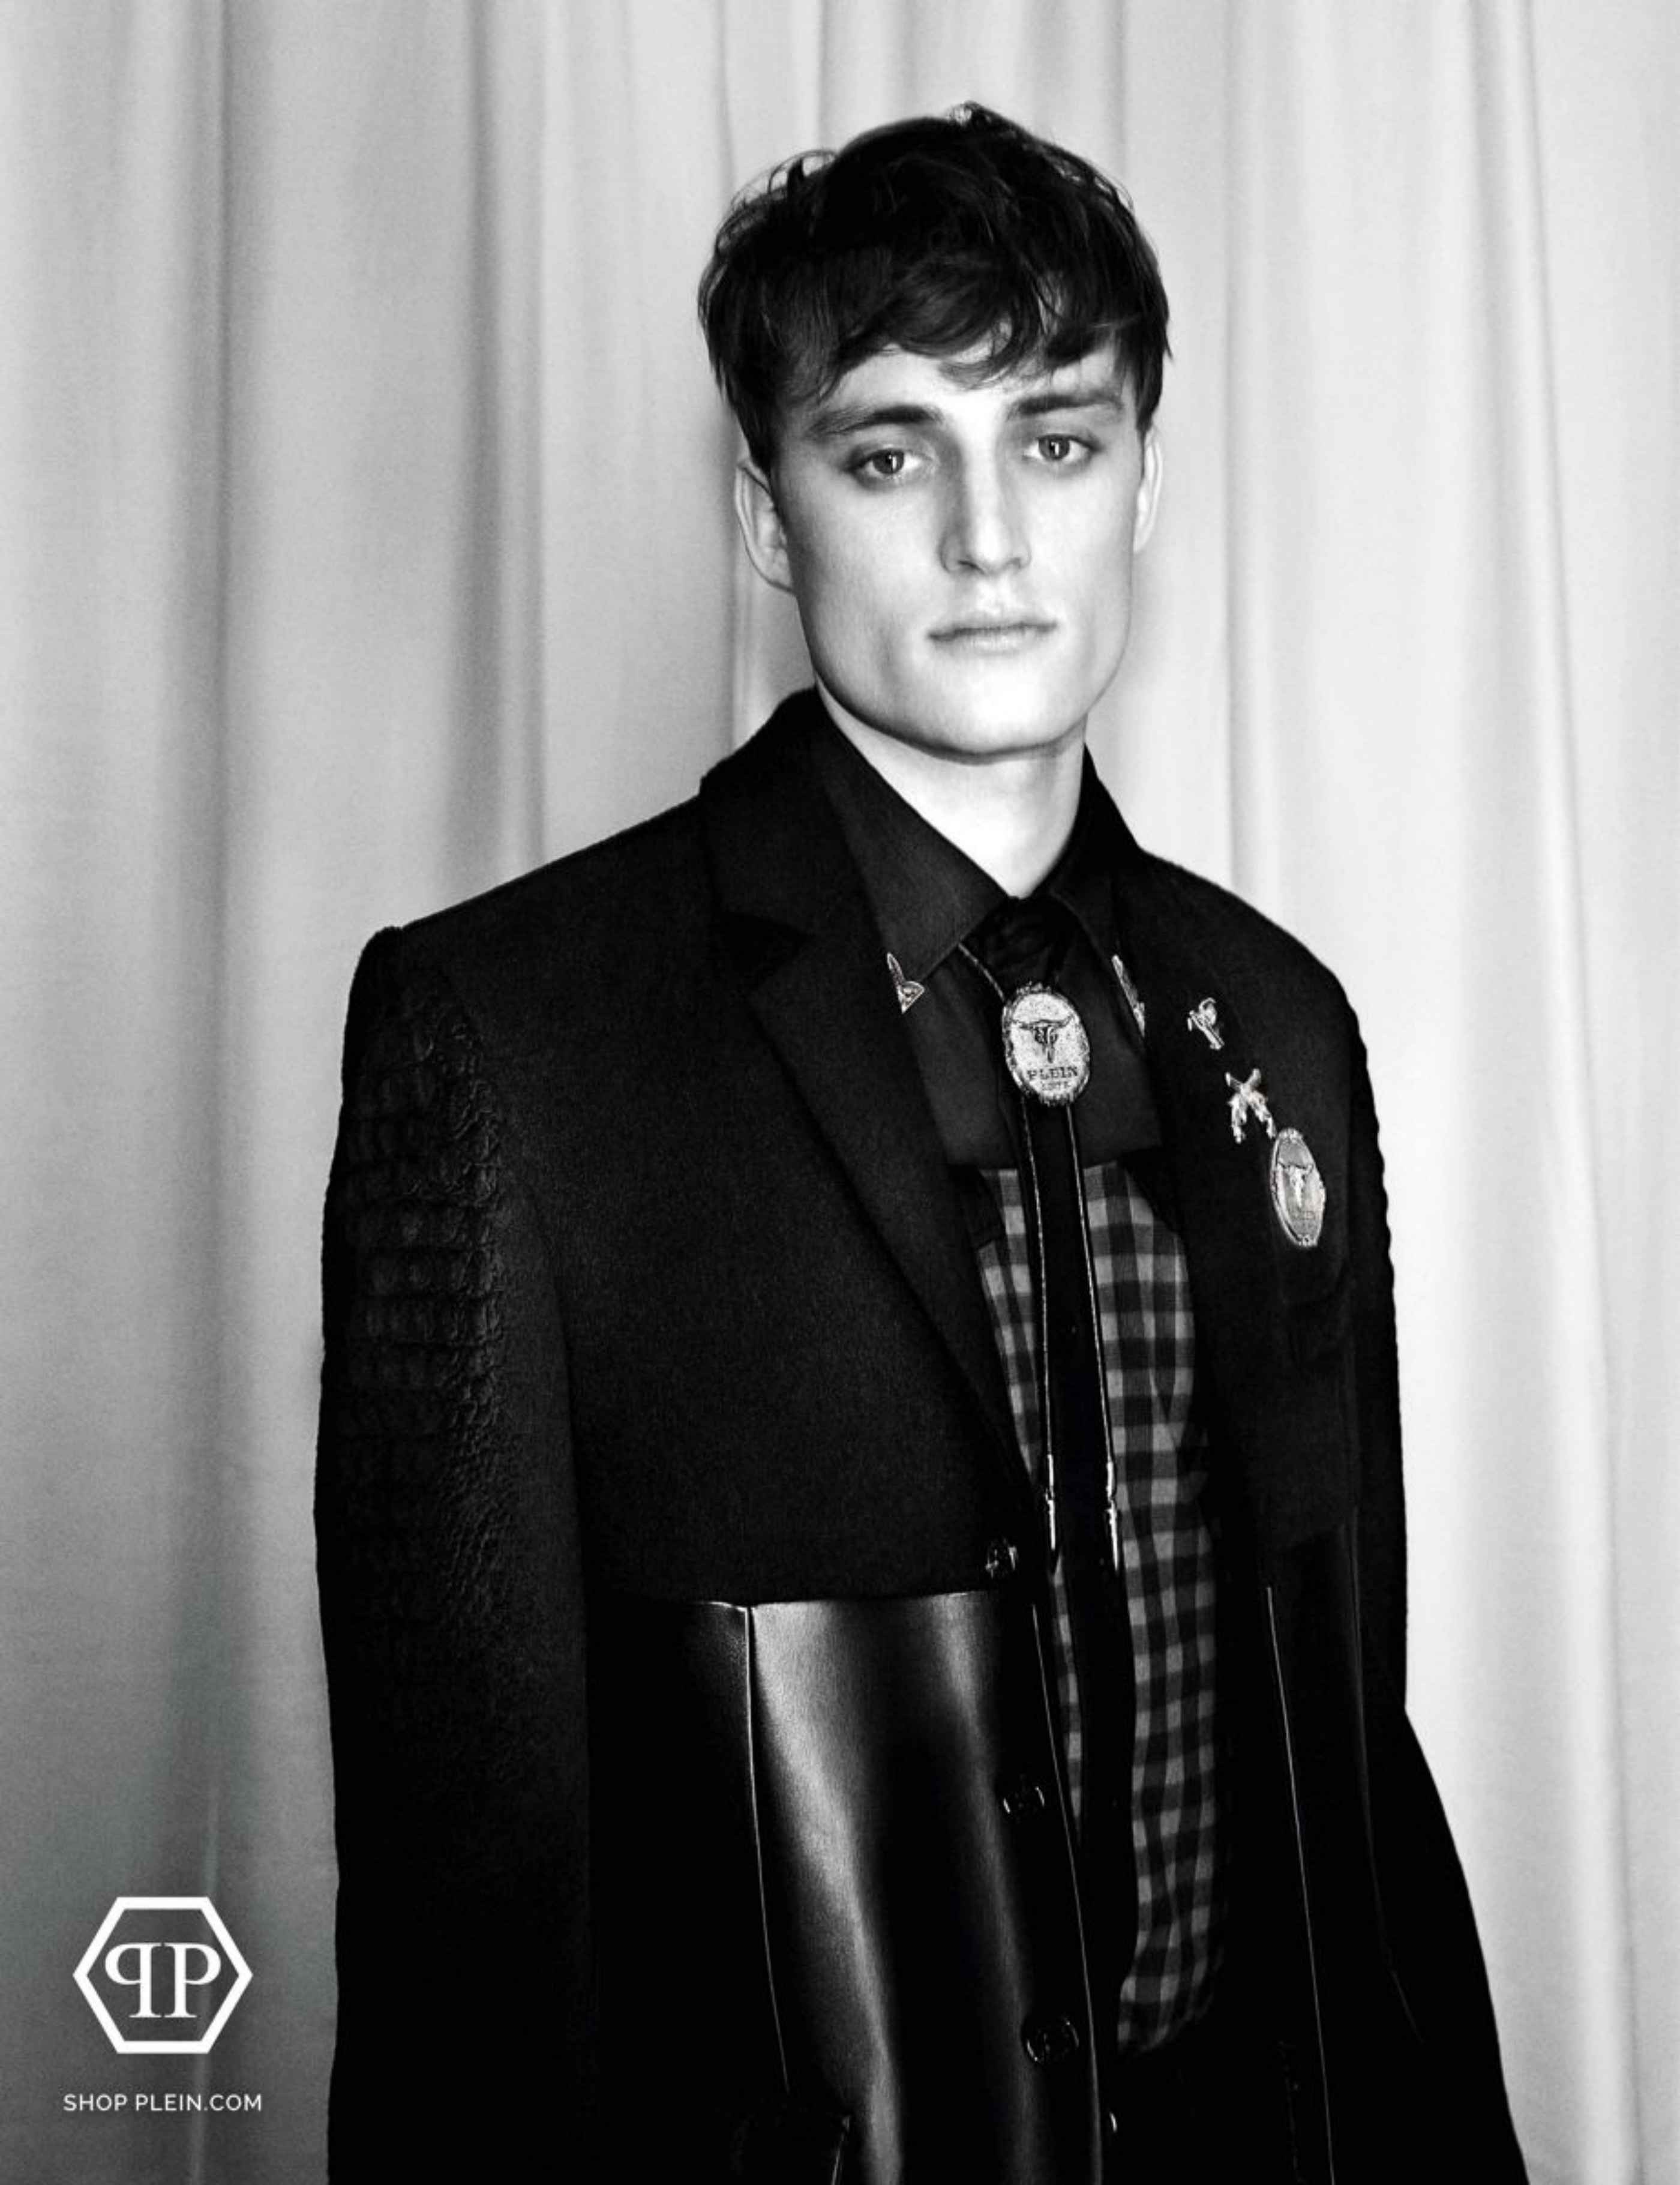 Bastiaan Van Gaalen for Philipp Plein Fall/Winter 2014 Ad Campaign